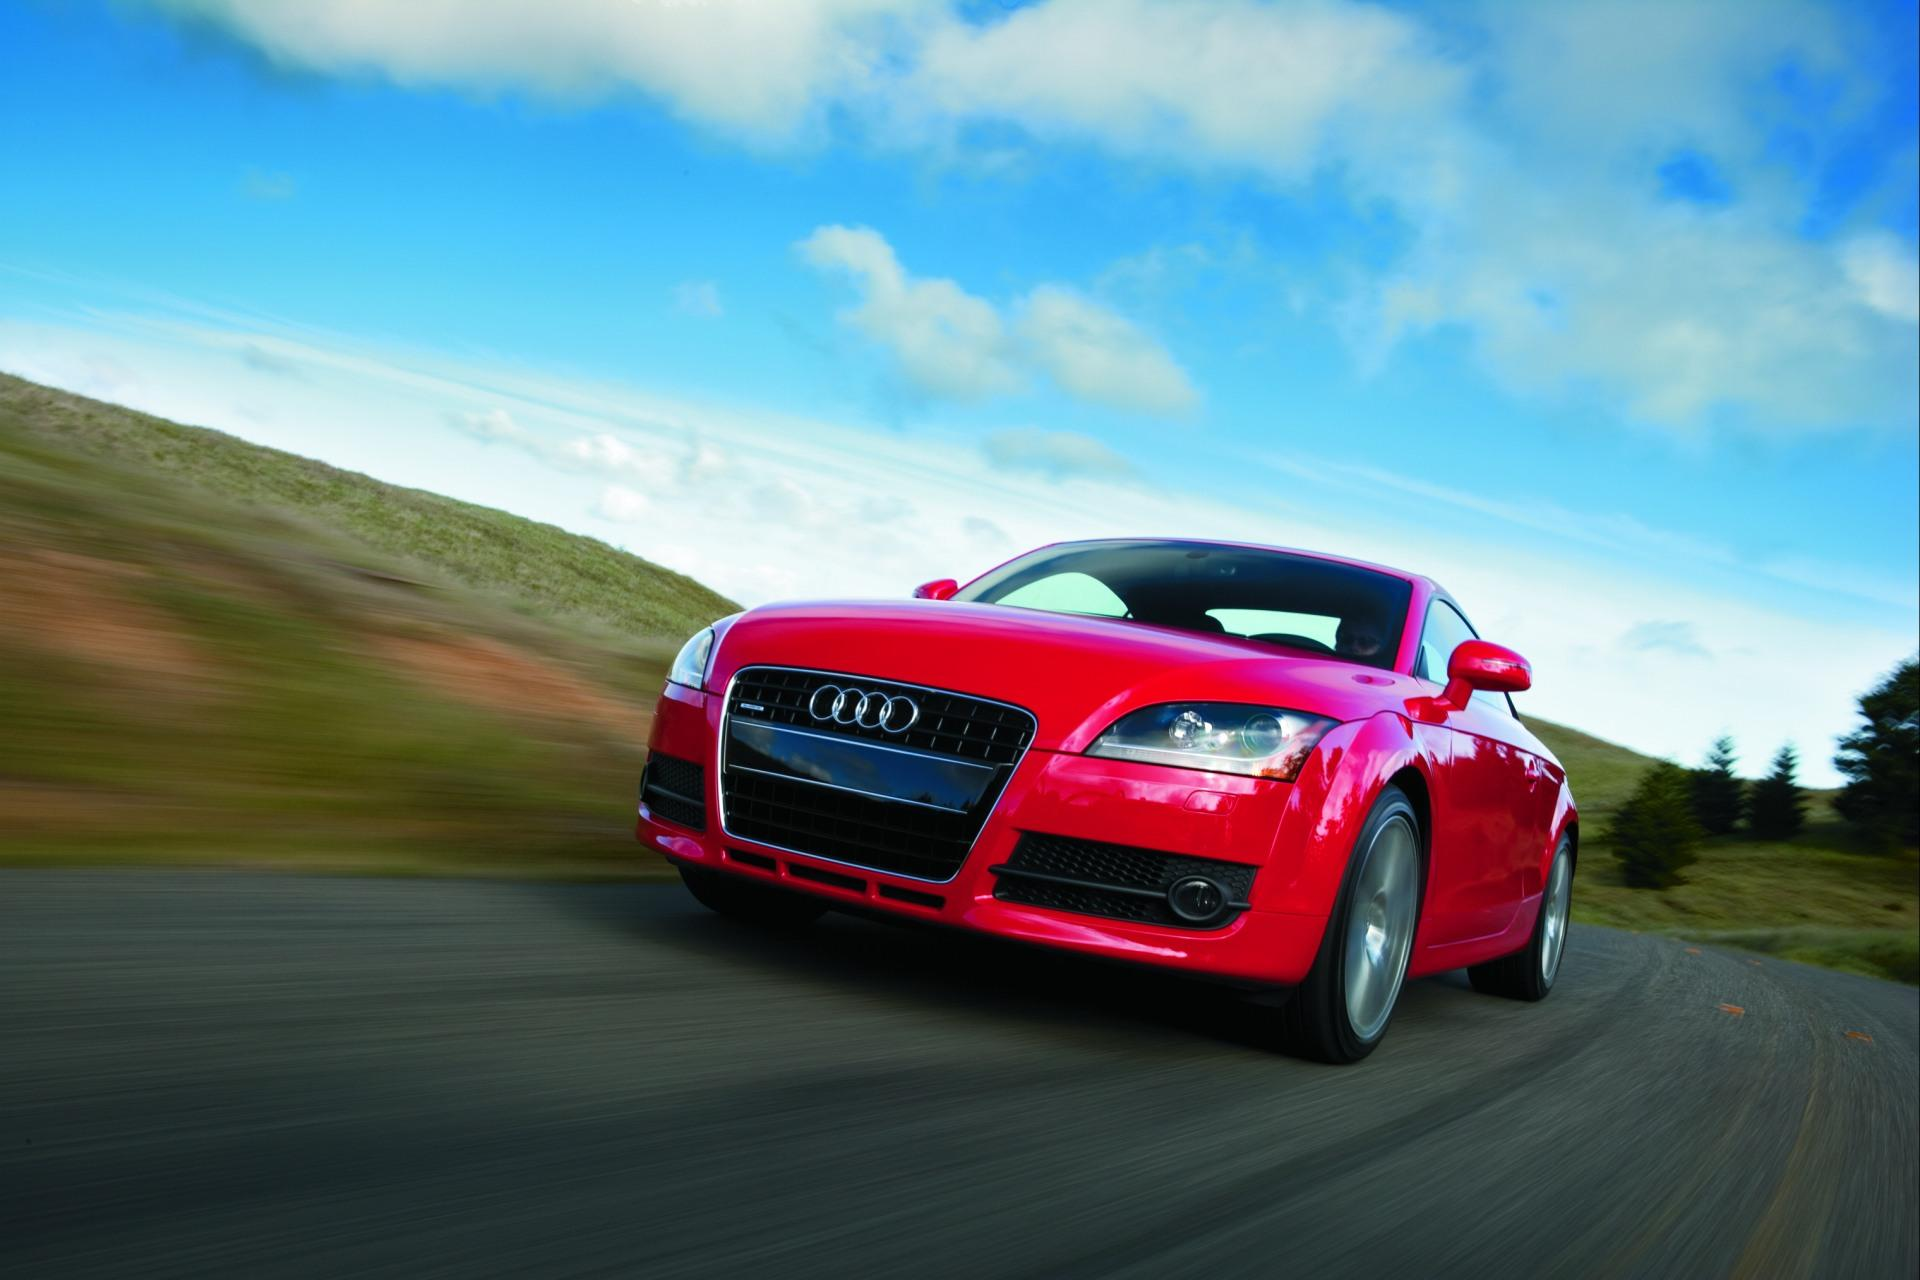 2009 Audi TT News and Information | conceptcarz.com